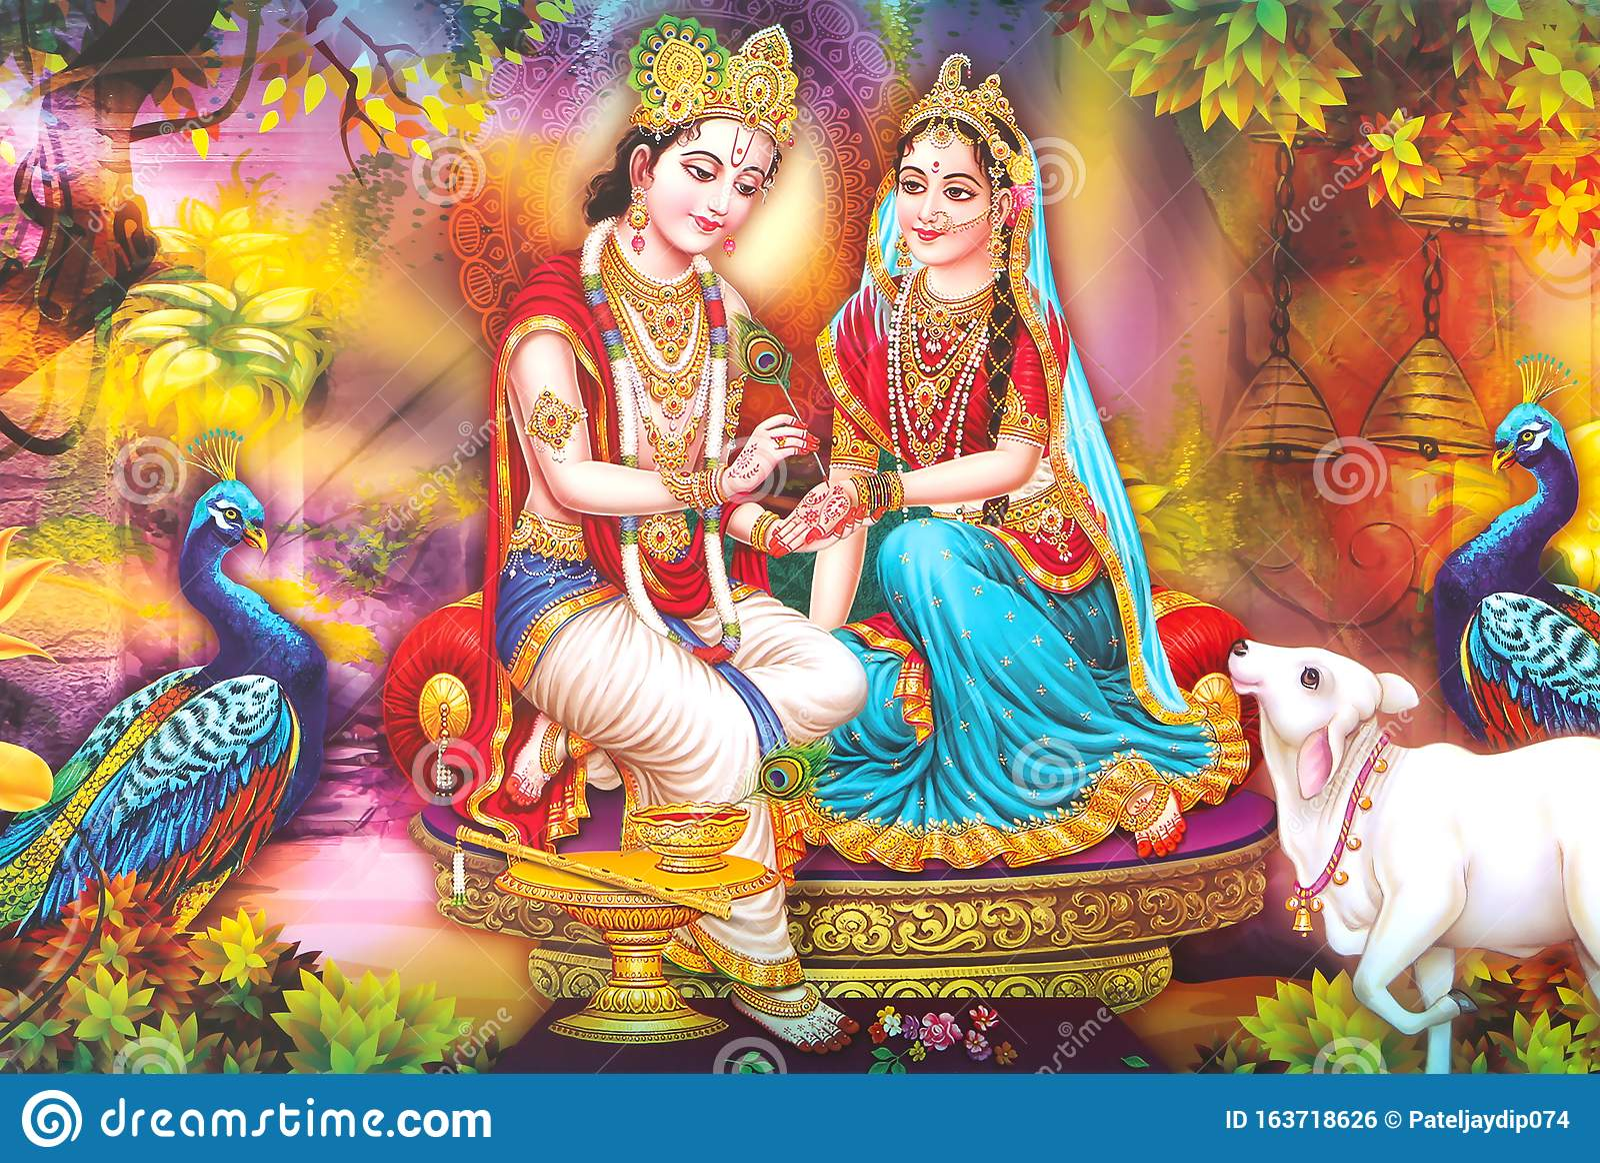 1 806 radha krishna photos free royalty free stock photos from dreamstime https www dreamstime com lord radha krishna beautiful wallpaper hindu god colorful background image163718626